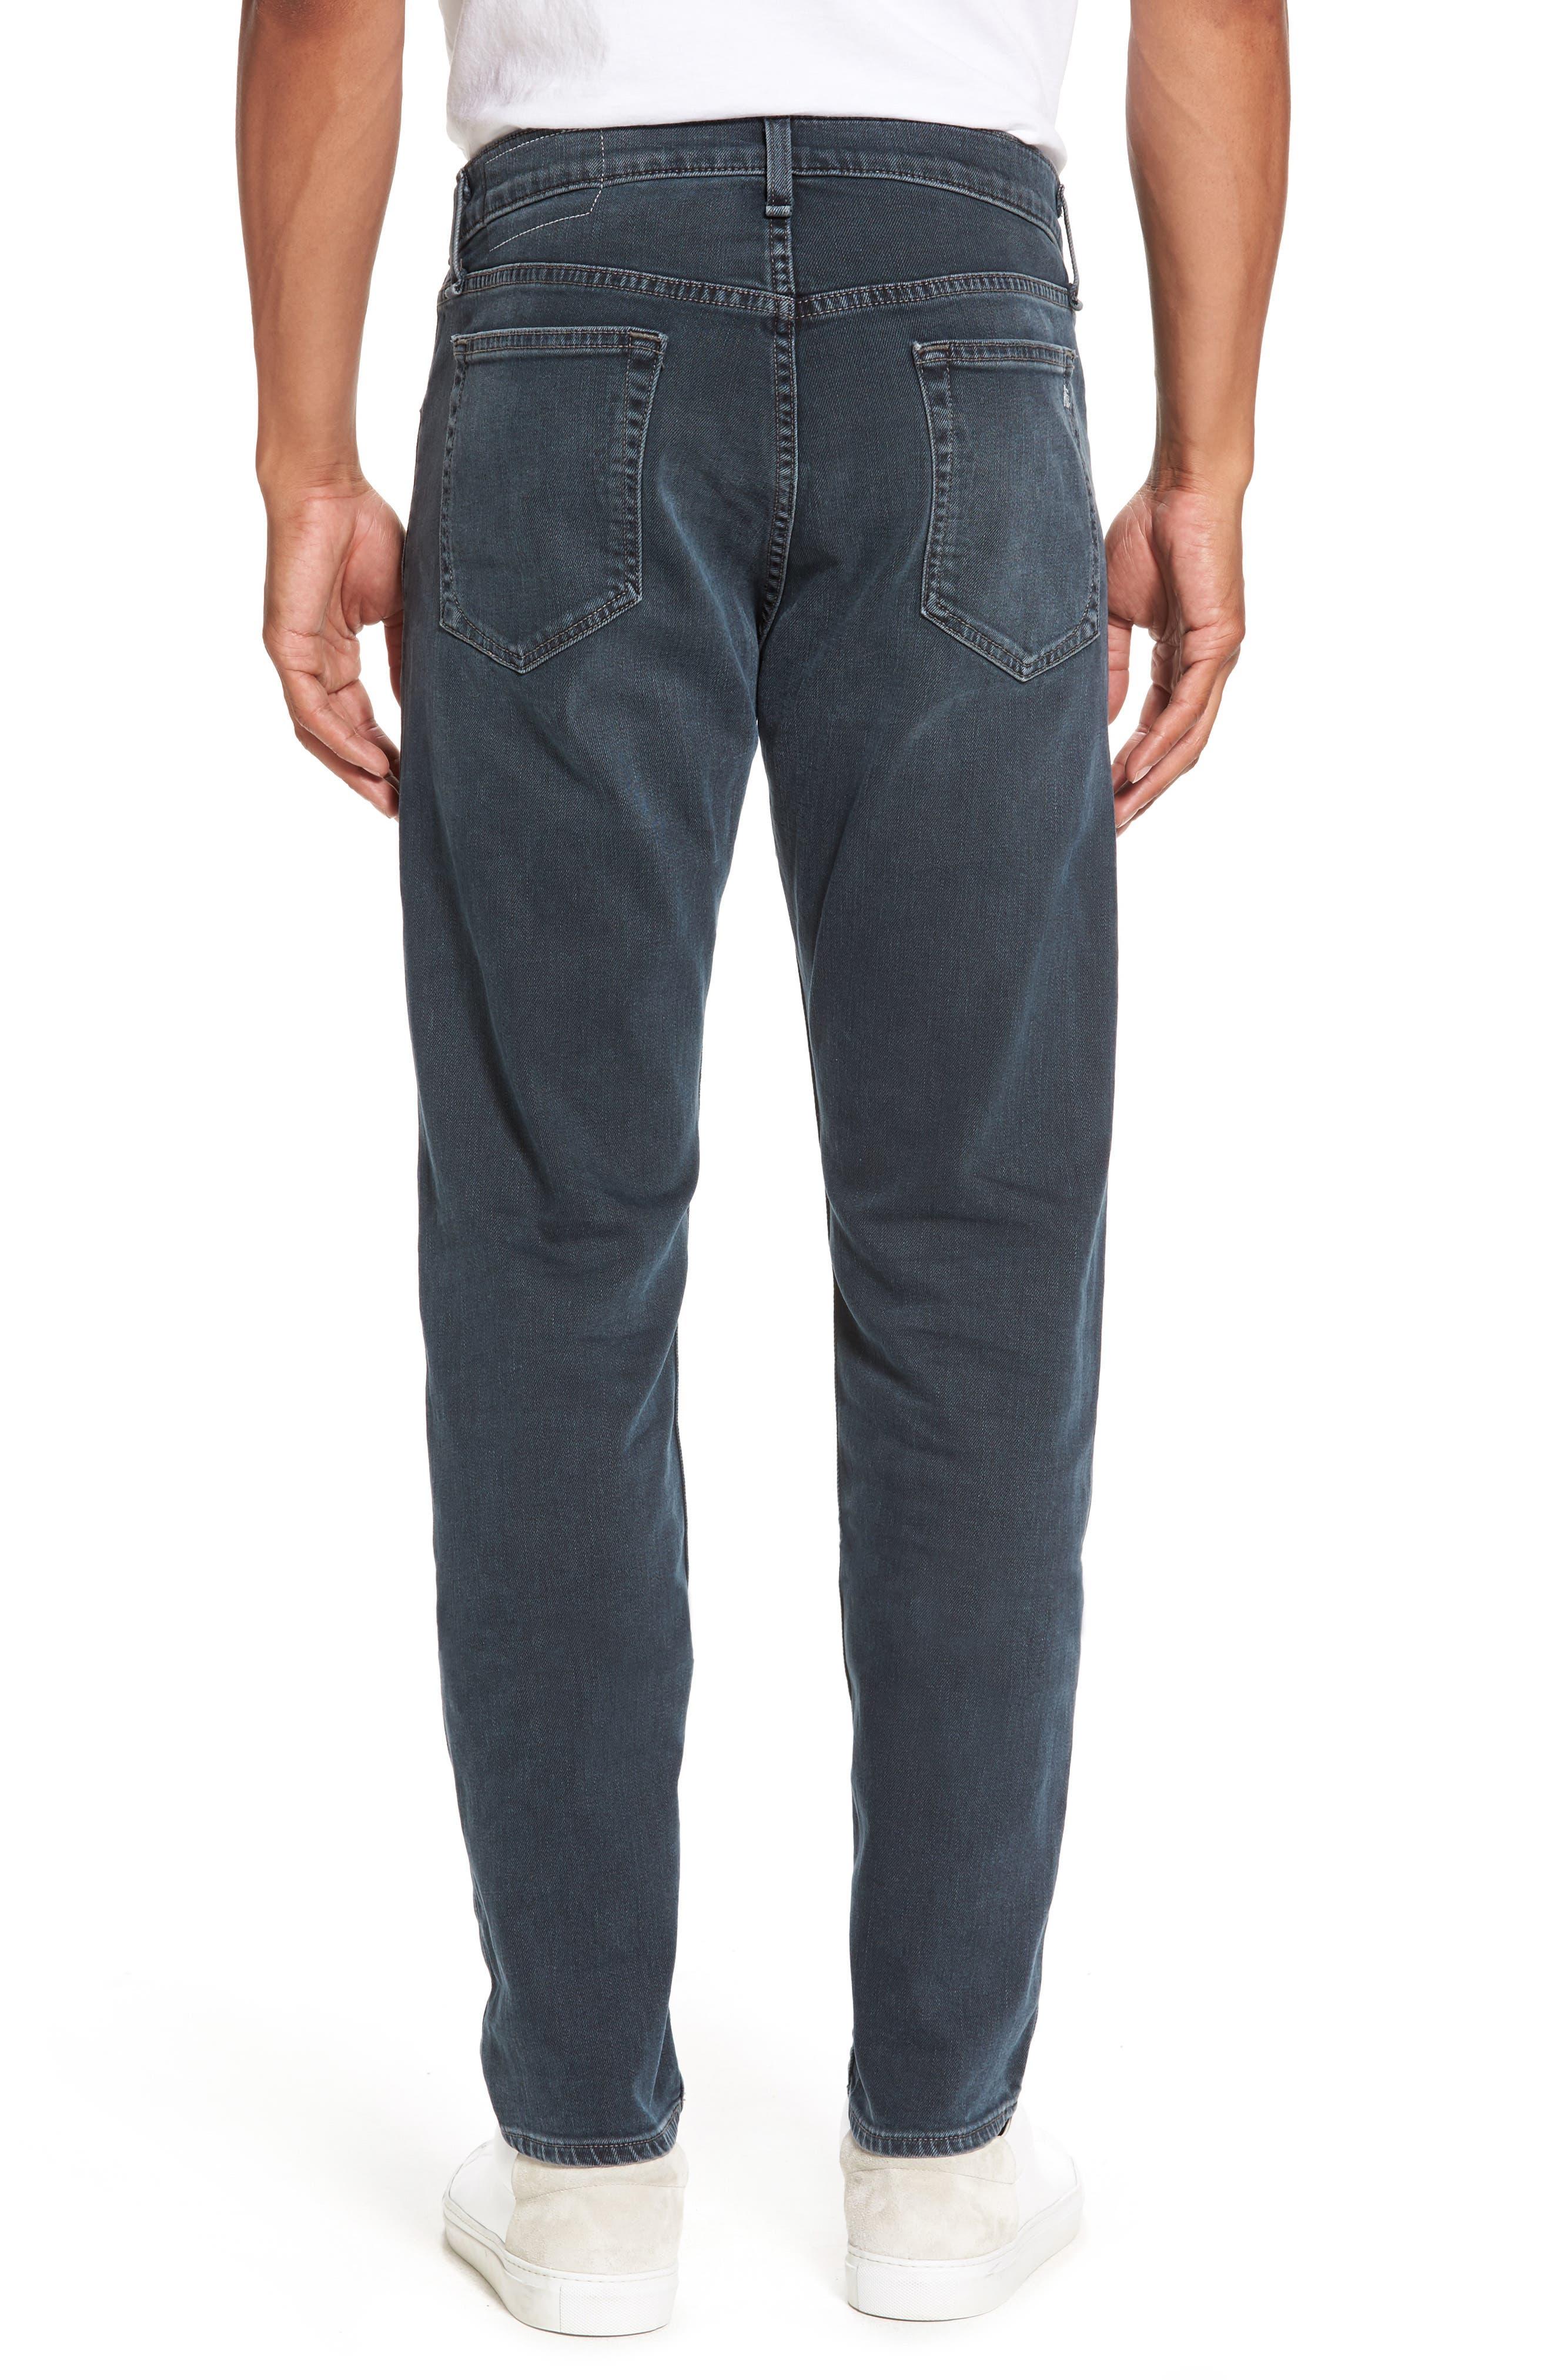 Fit 2 Slim Fit Jean,                             Alternate thumbnail 2, color,                             MINNA